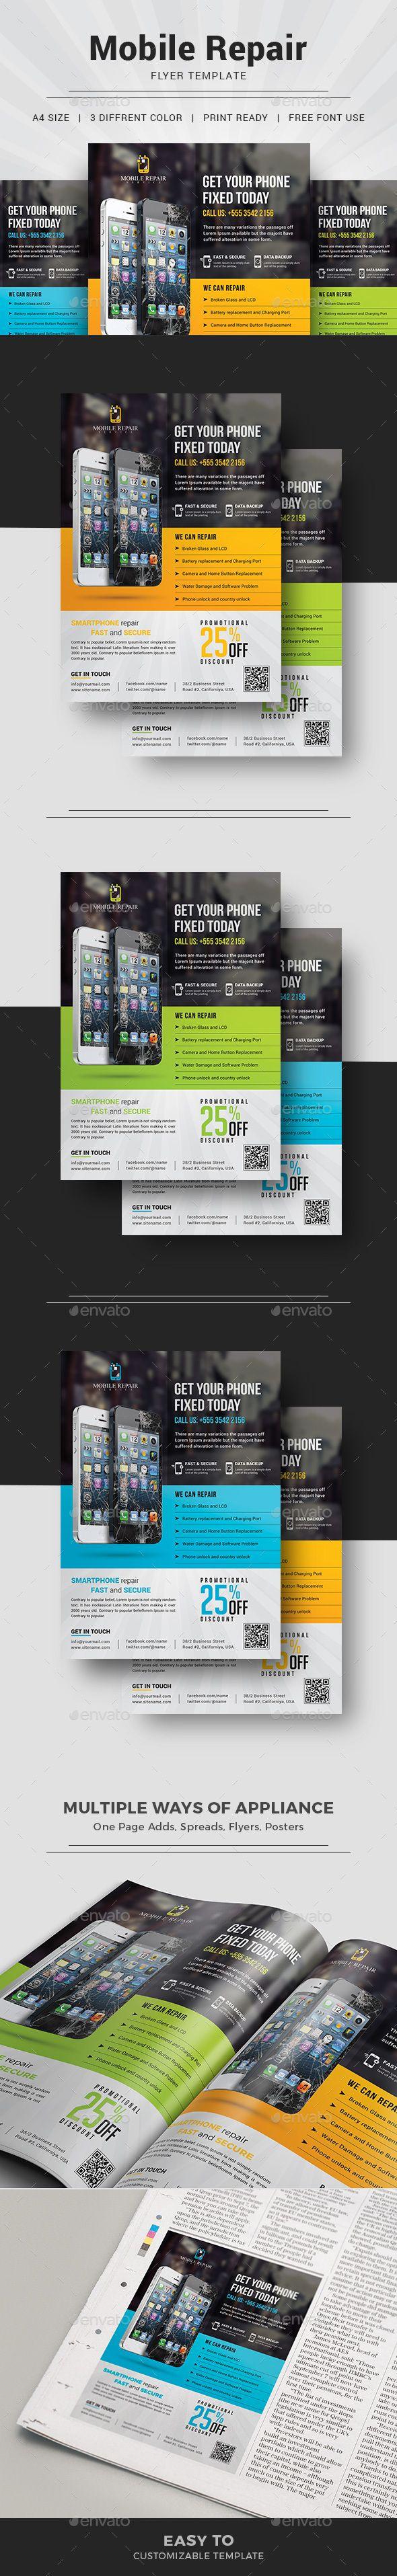 Smartphone Repair Service Flyer | Best Flyer Templates | Pinterest